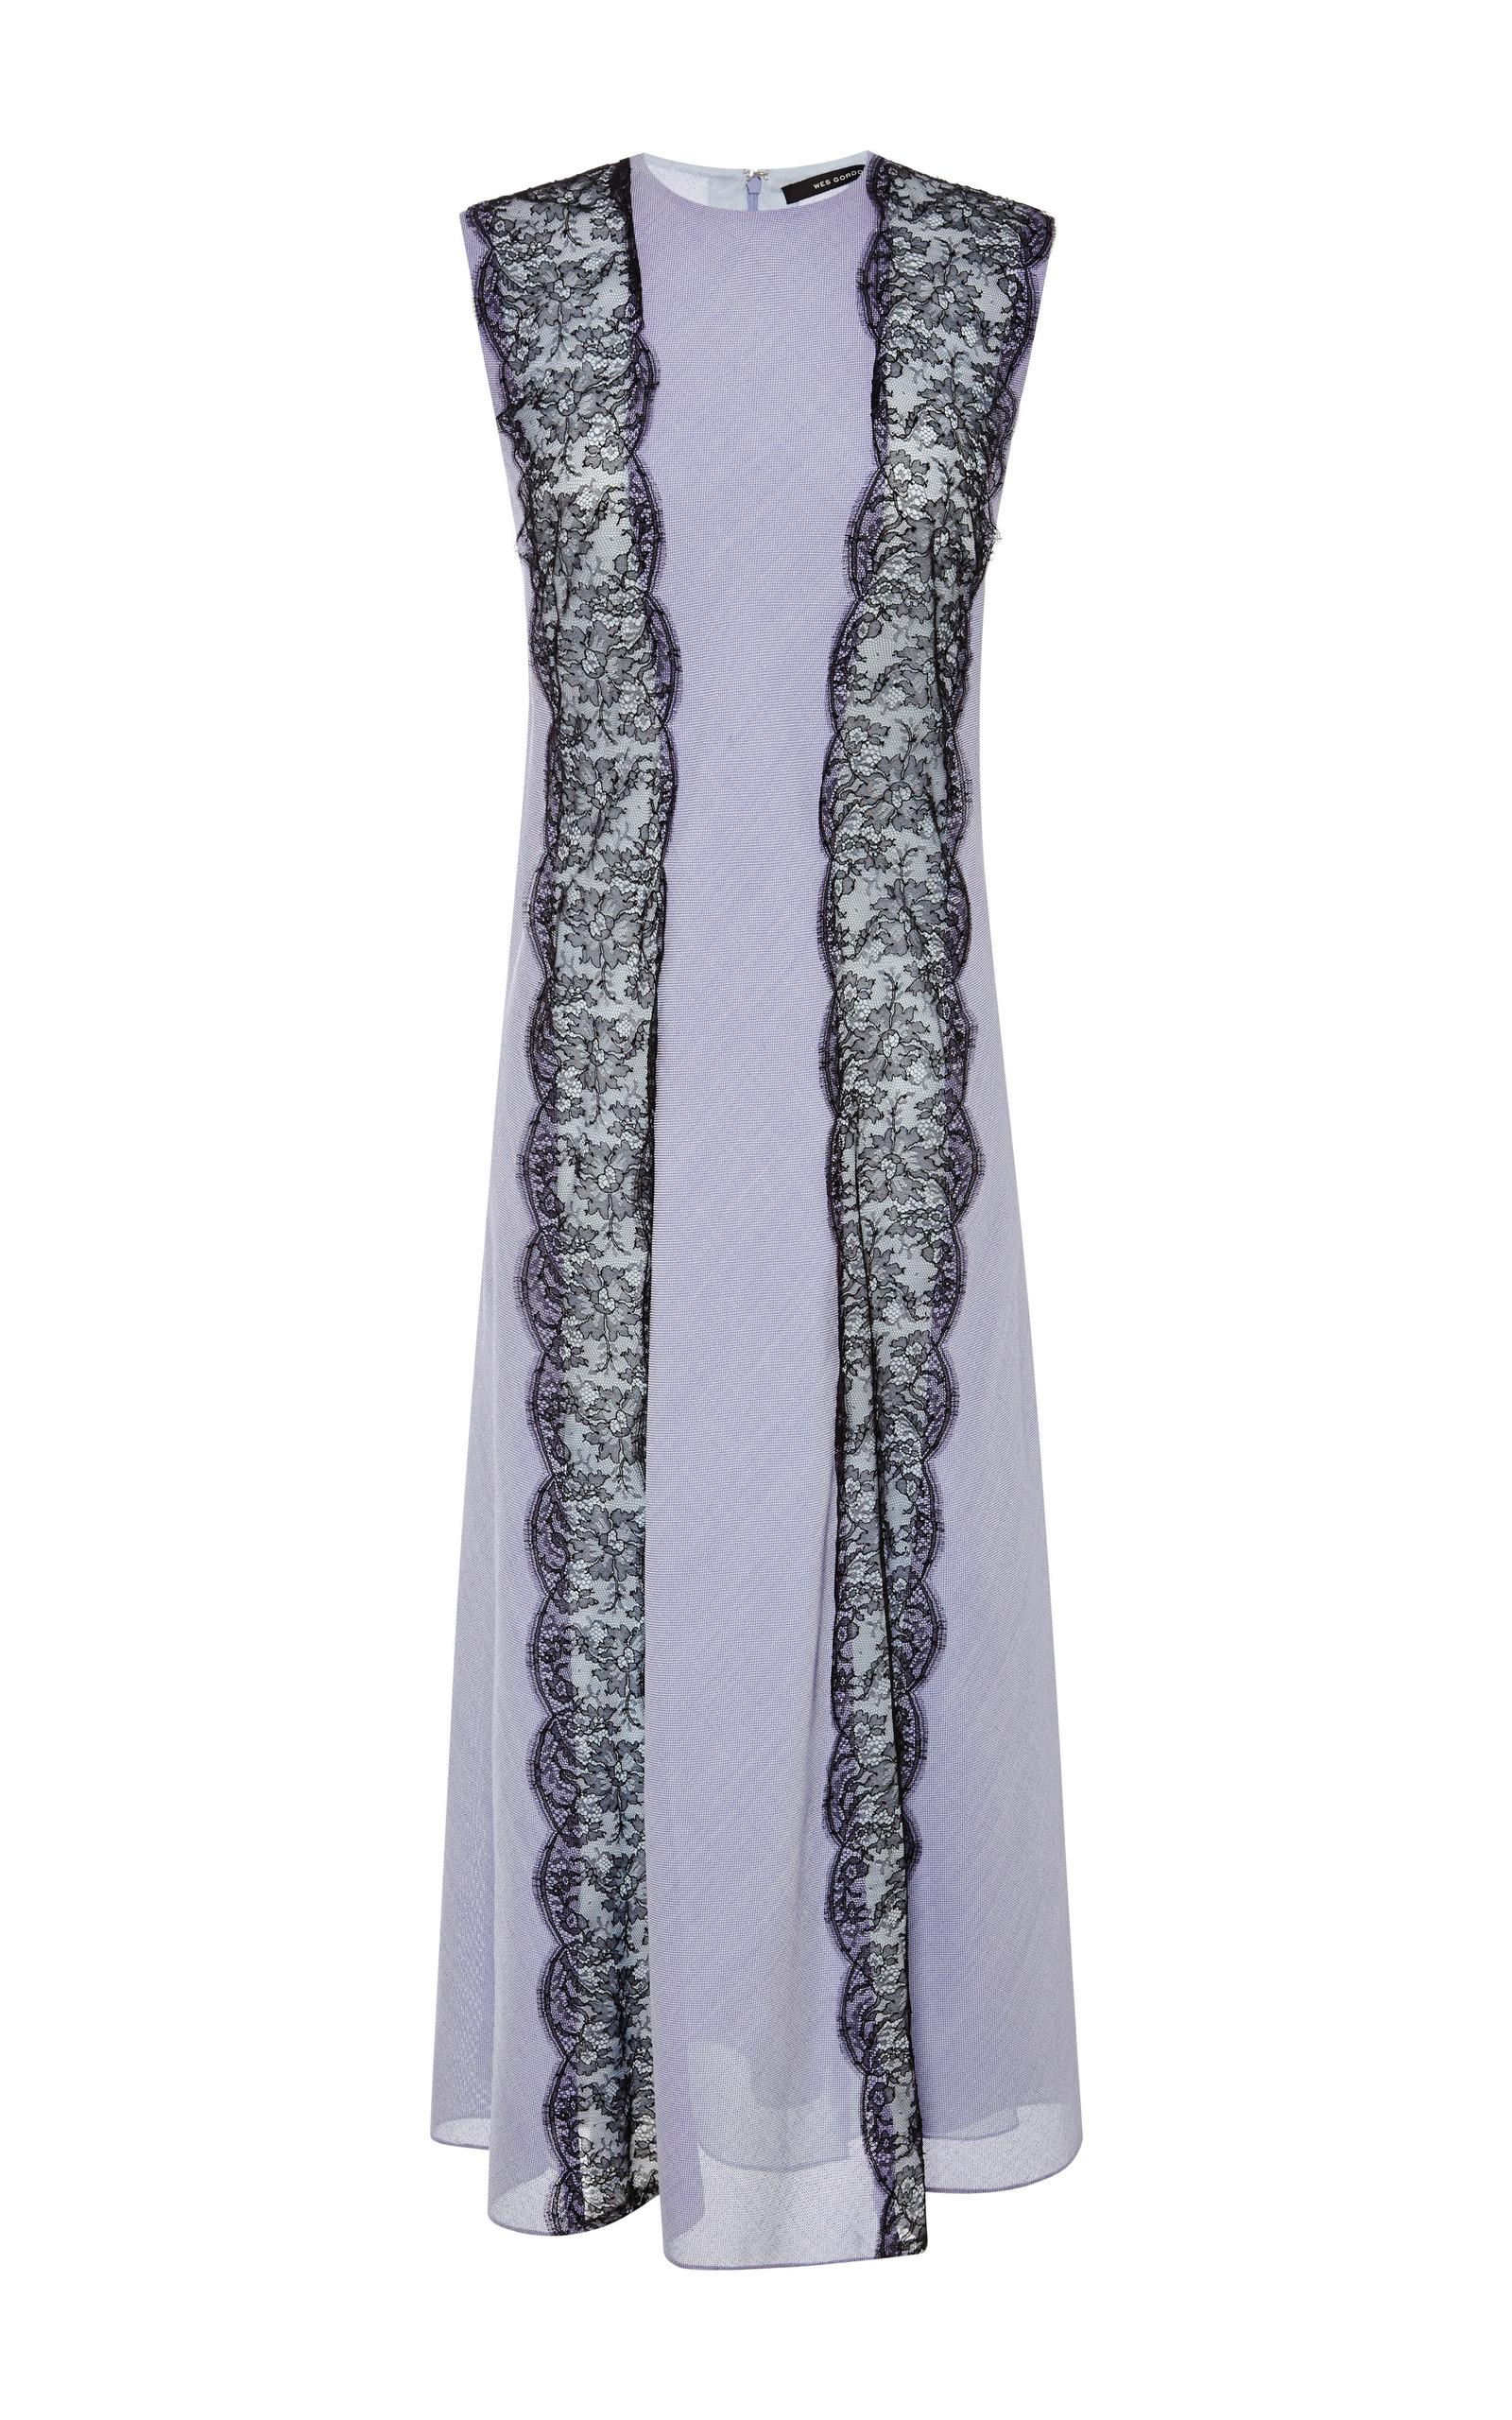 bda91c54fa76 Sleeveless Banded Lace Dress by Wes Gordon | Moda Operandi